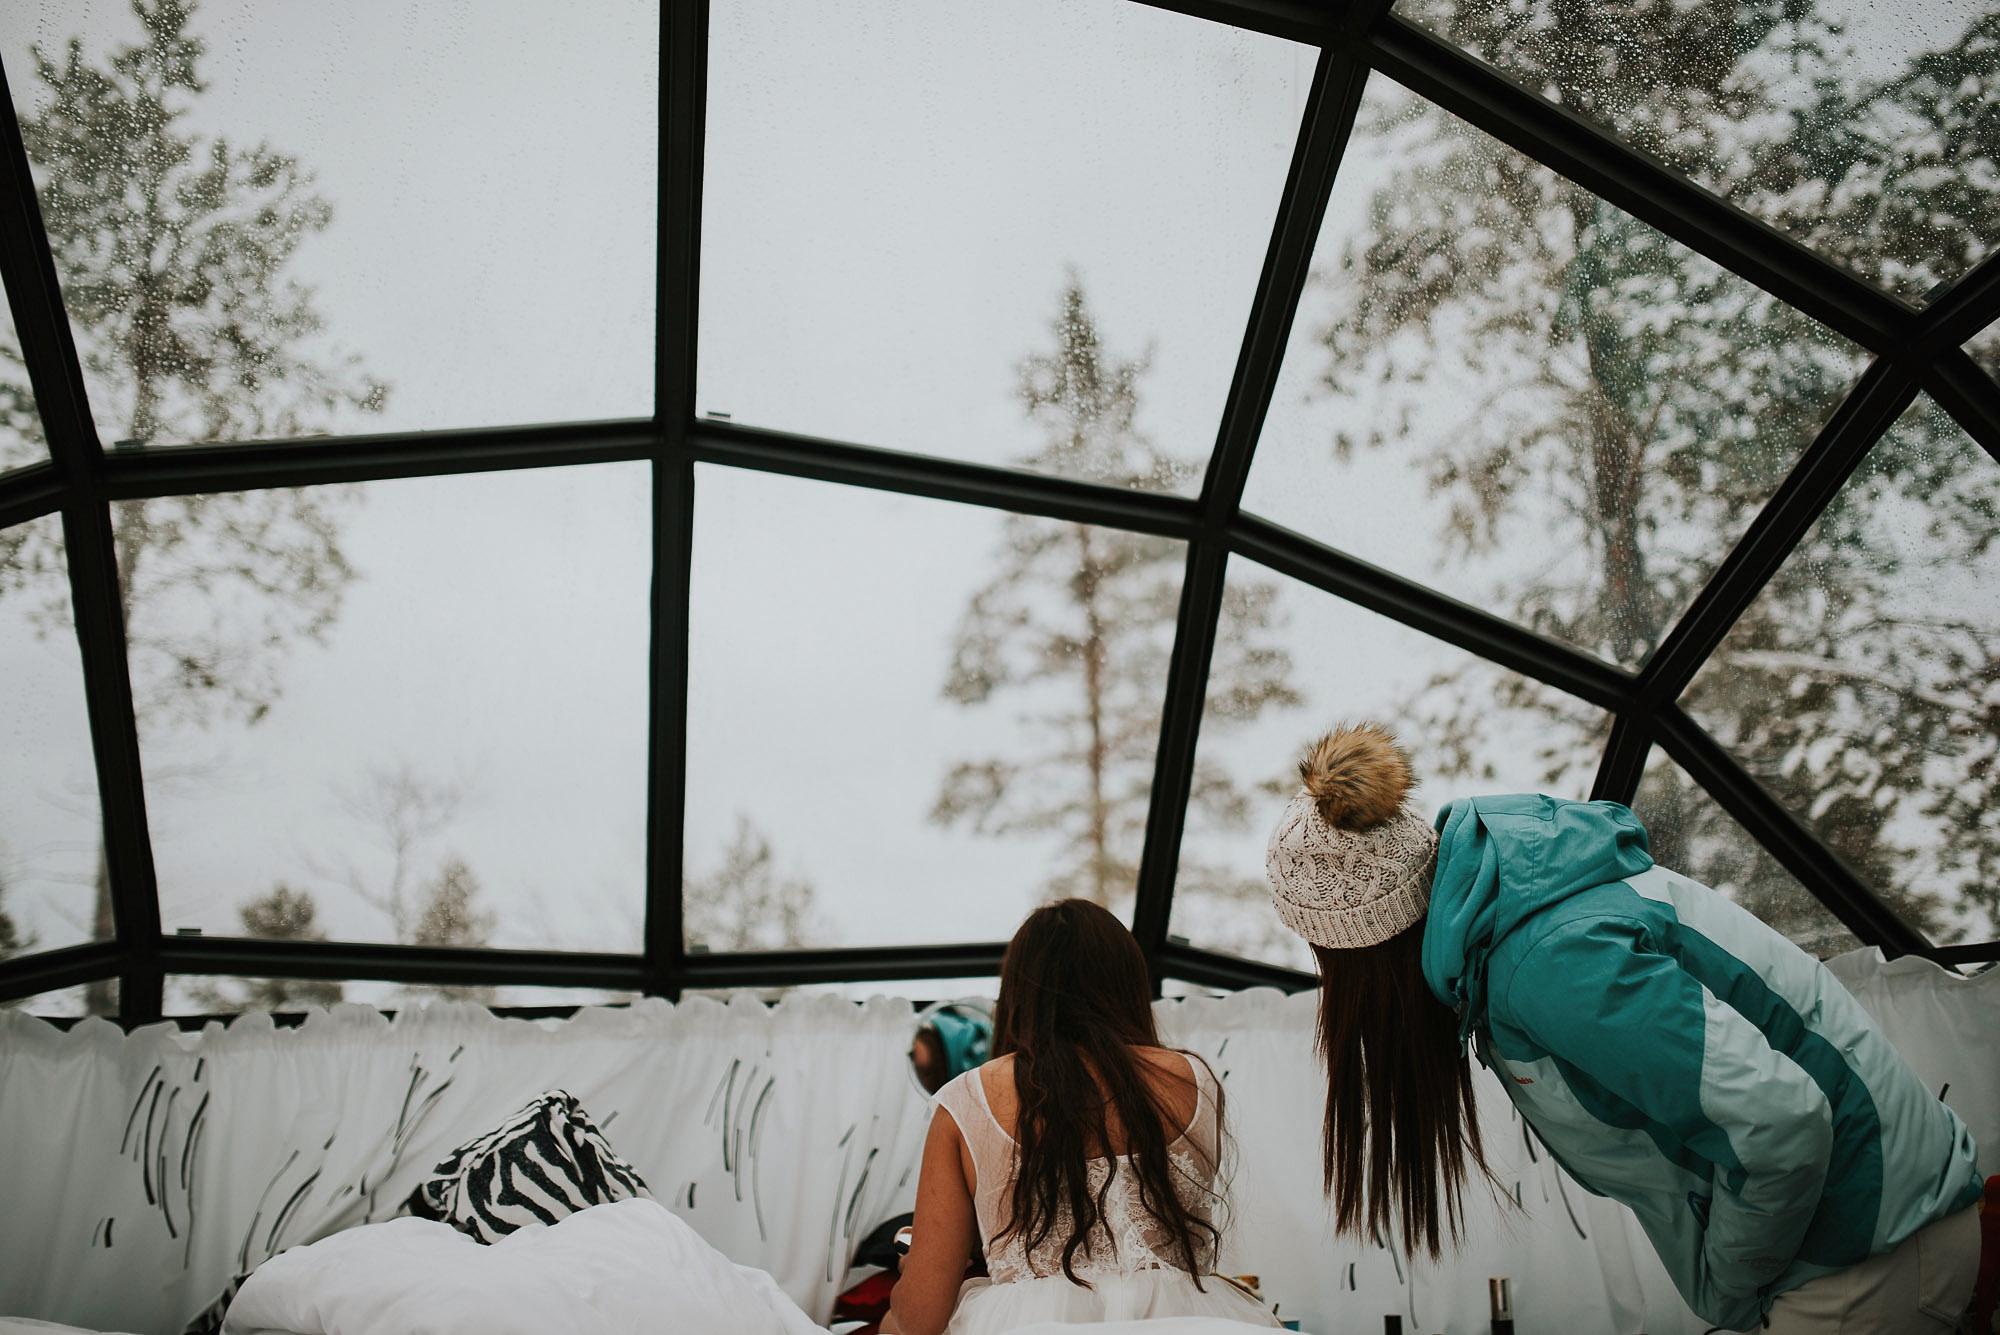 levi-ice-chapel-weddings-lapland-finland-photographer-jere-satamo-004-blog.jpg